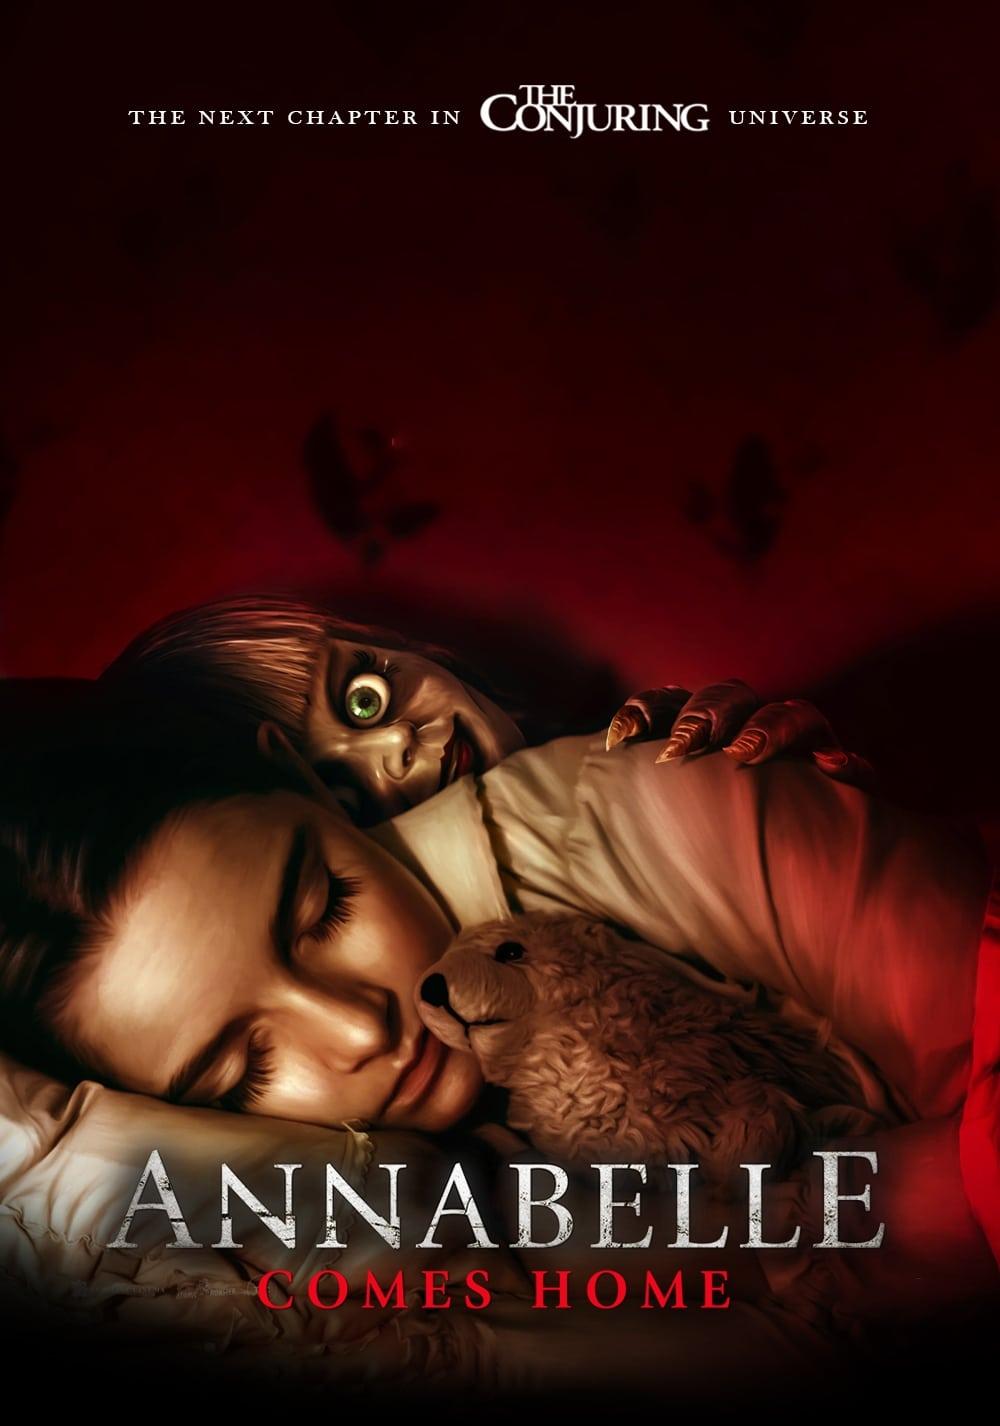 Pelicula Annabelle 3: Viene a Casa (2019) HD 1080P LATINO/INGLES Online imagen